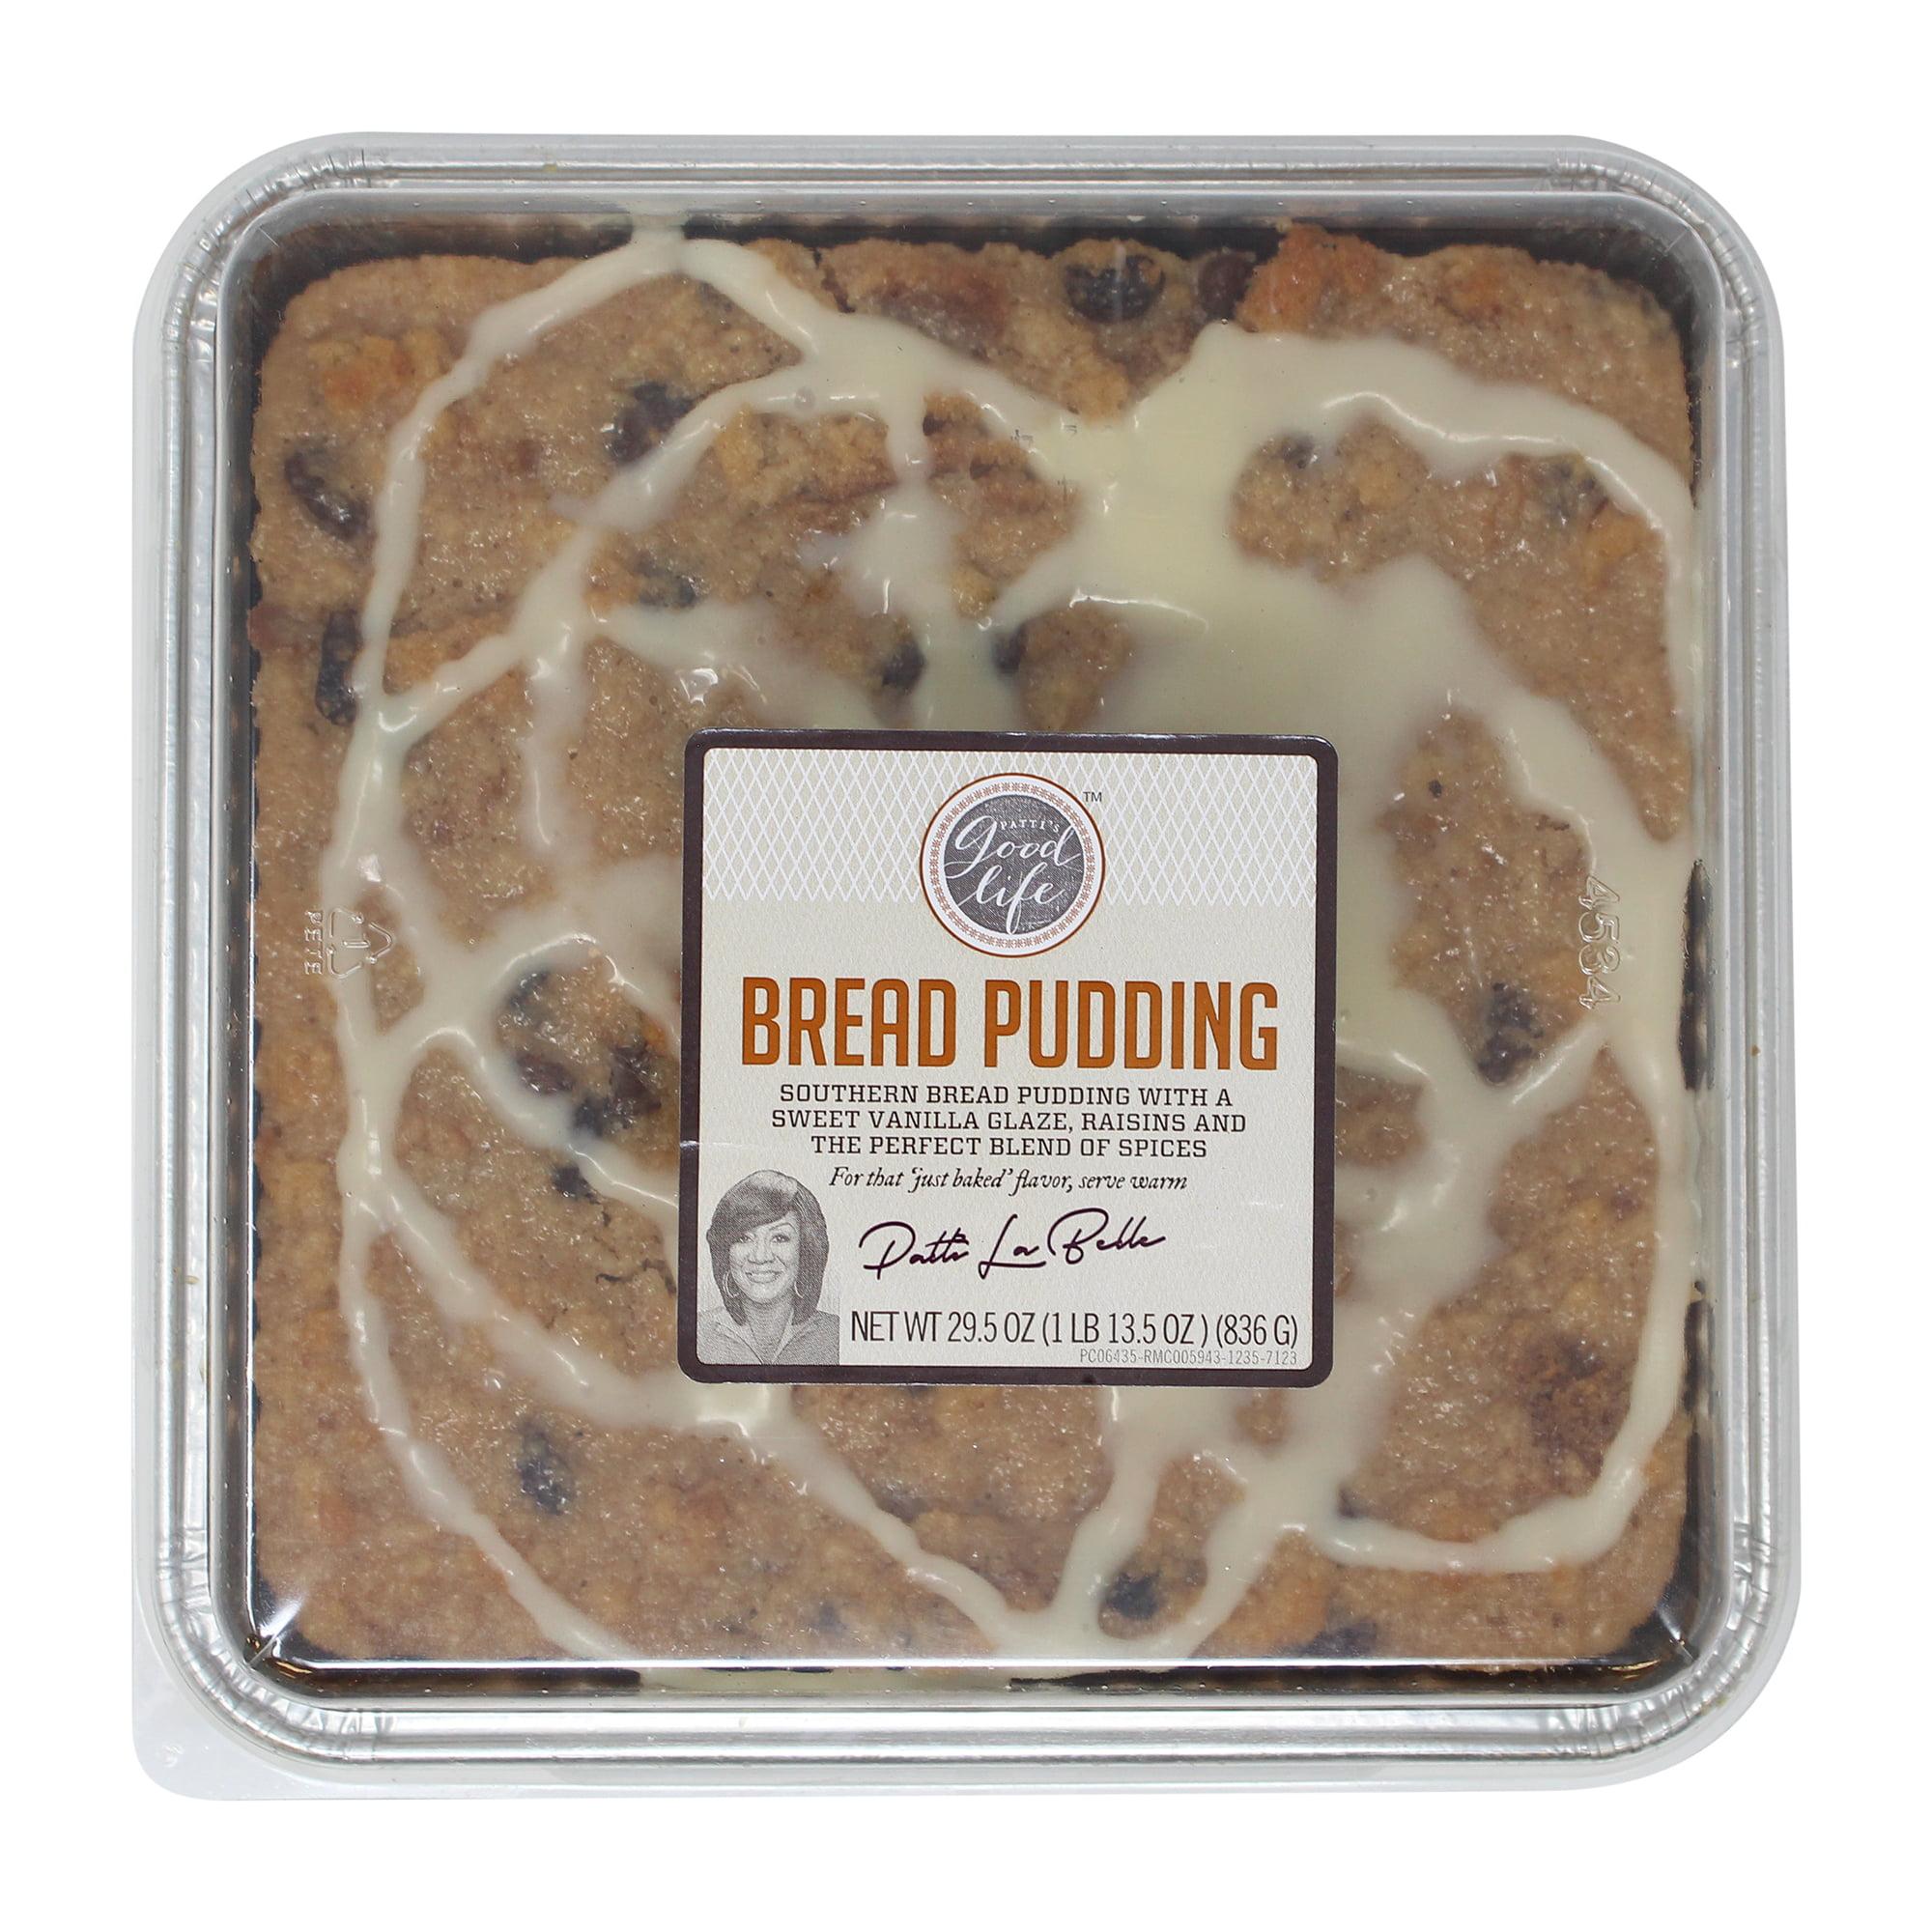 Patti LaBelle Southern Bread Pudding with Raisins and a Sweet Vanilla Glaze, 29.5 oz